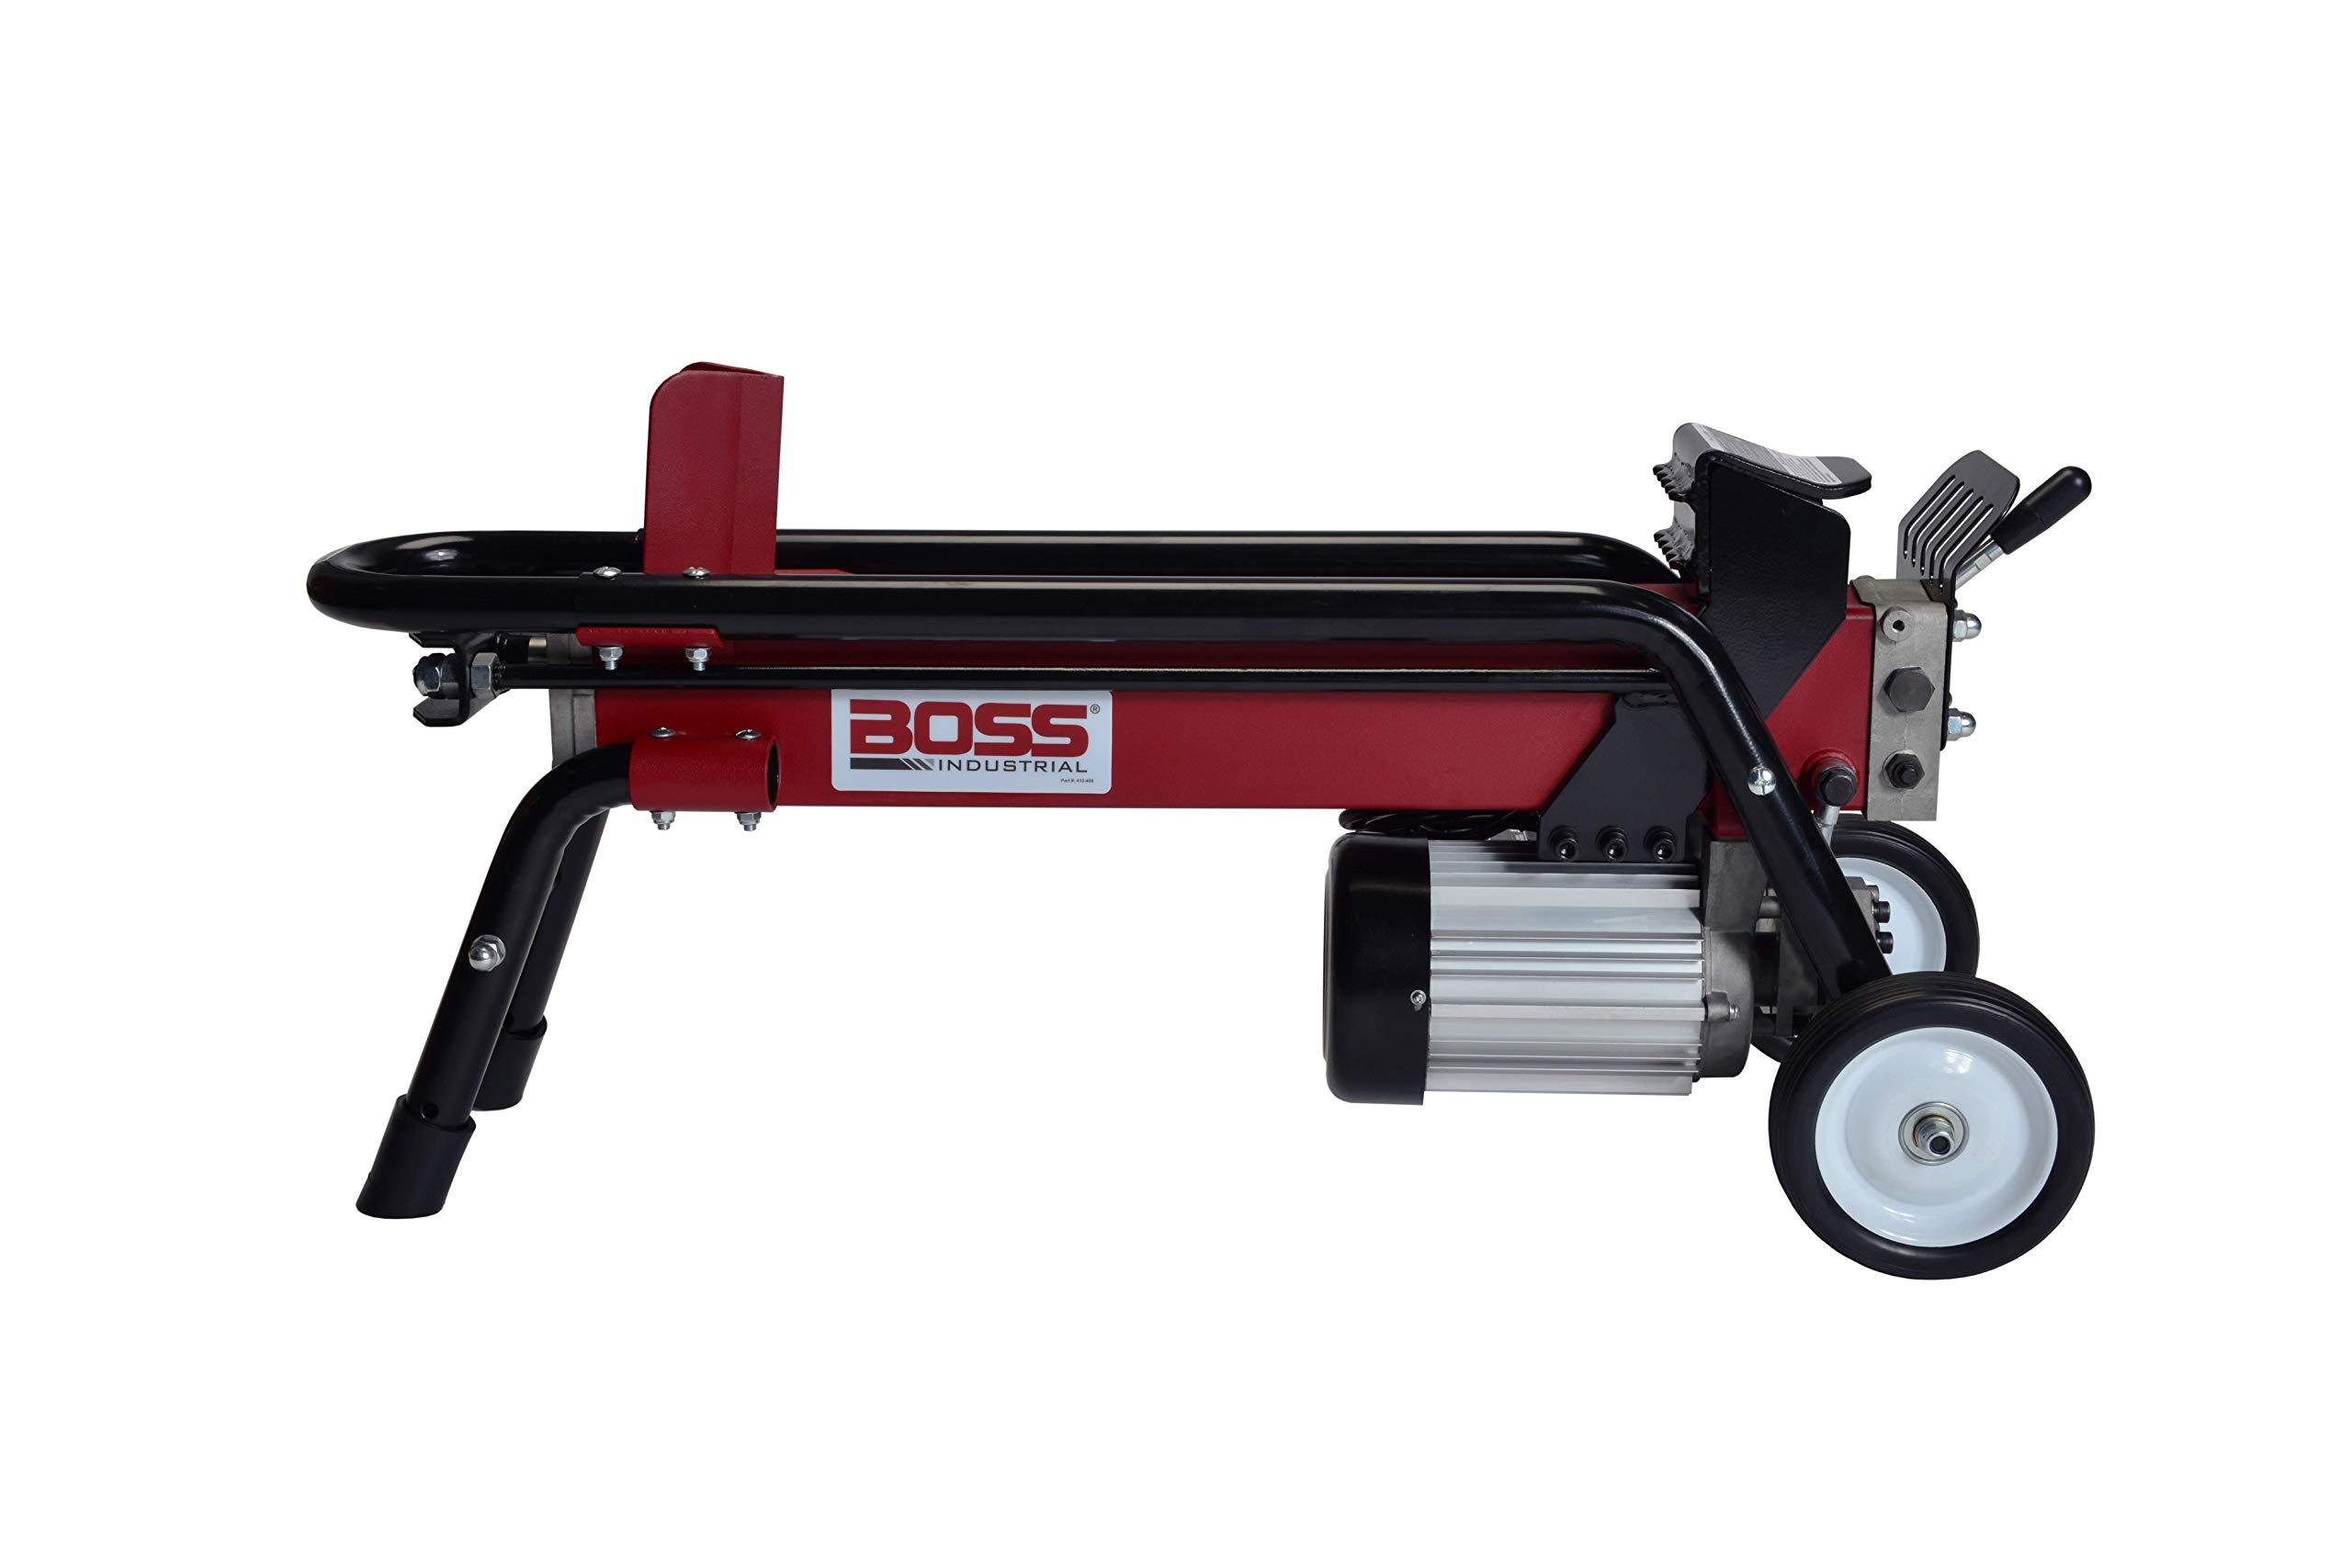 Boss Industrial ES7T20 Electric Log Splitter, 7-Ton by Boss Industrial